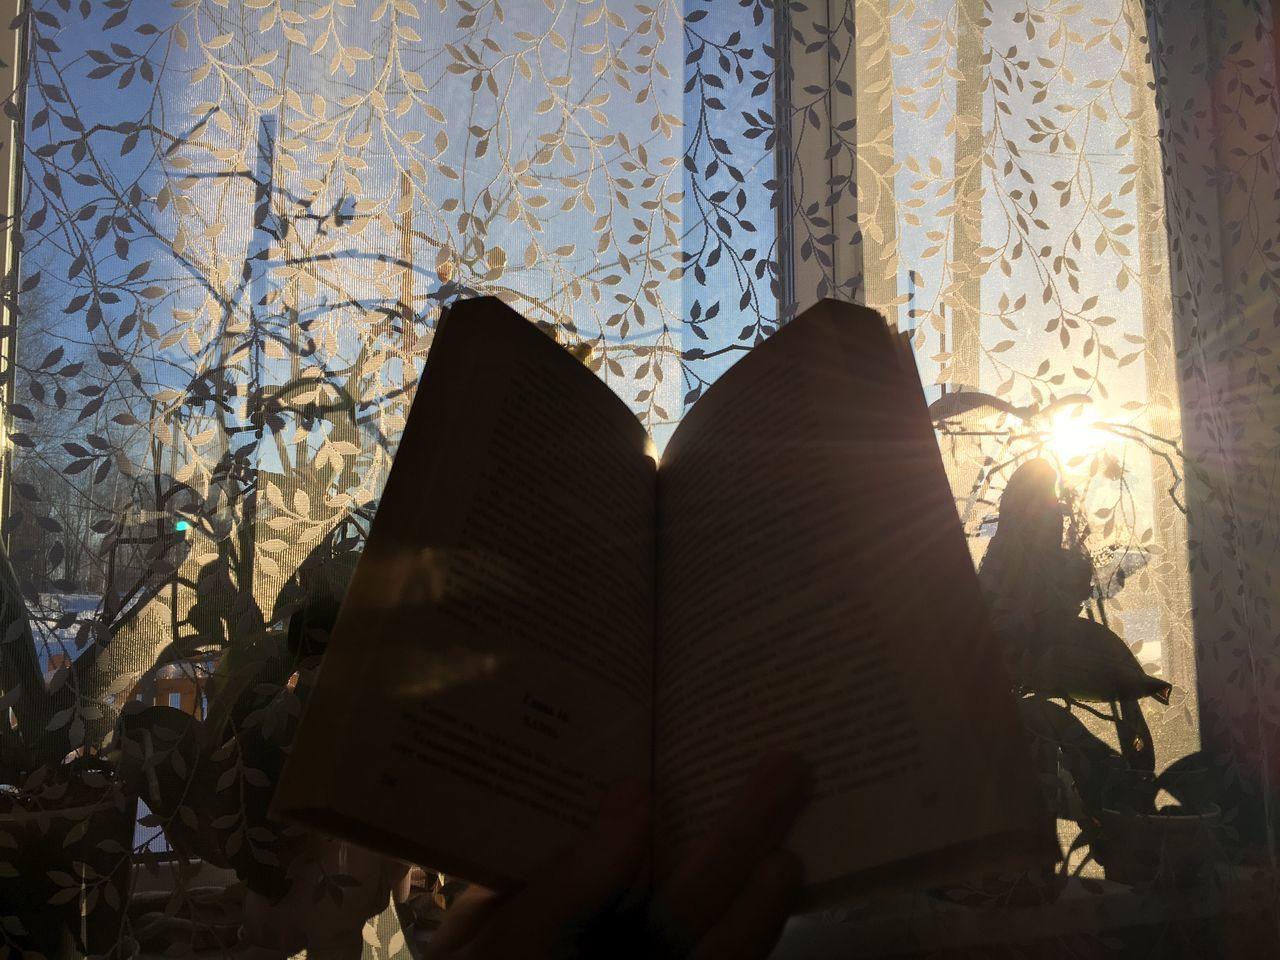 Book Books Books ♥